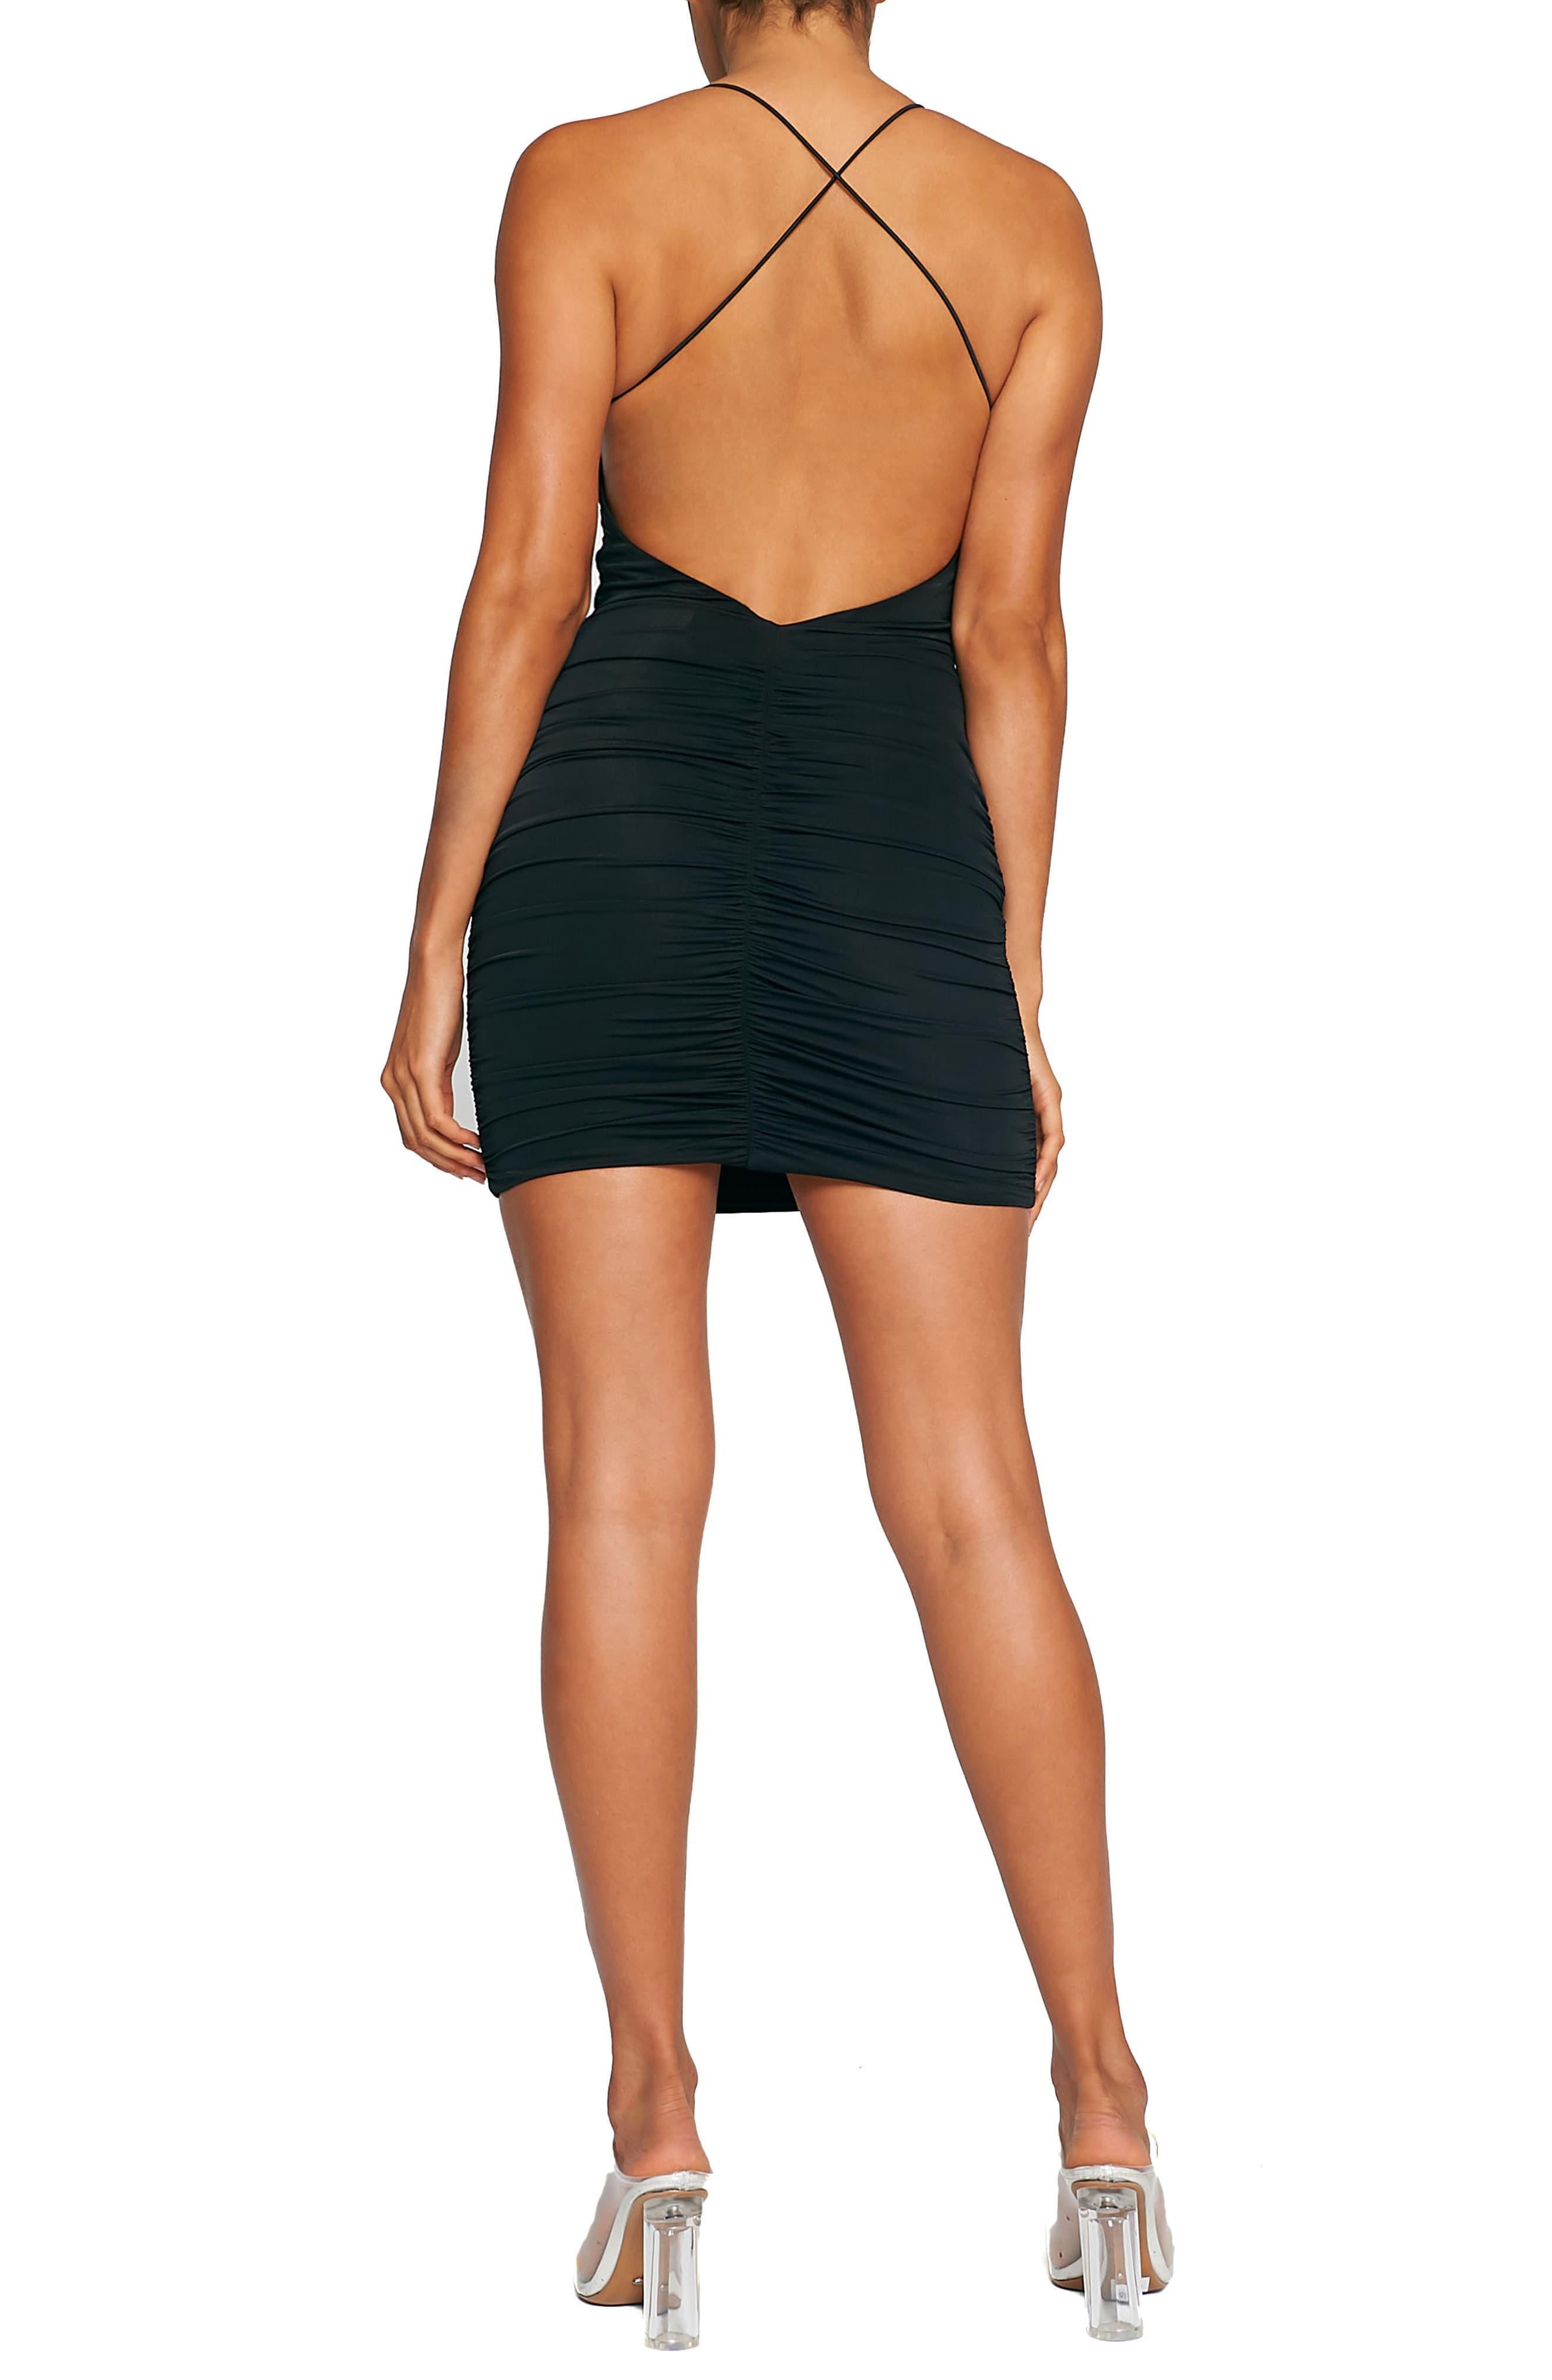 Tiger Mist Reese Body Con Dress In Black Lyst